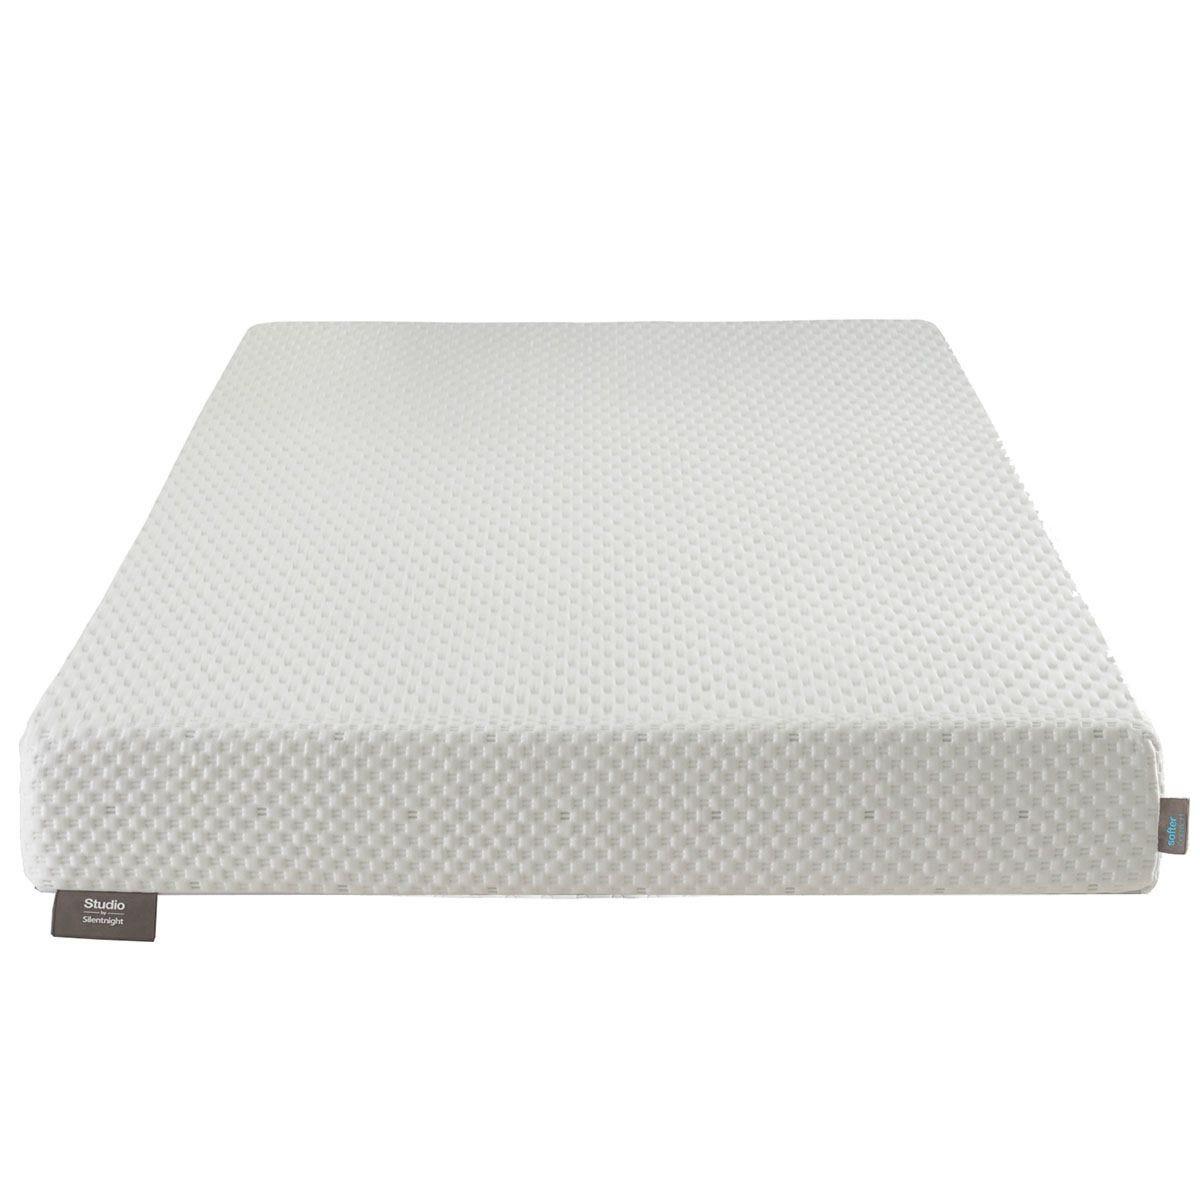 Silentnight Studio Softer Flat Super King Mattress - White